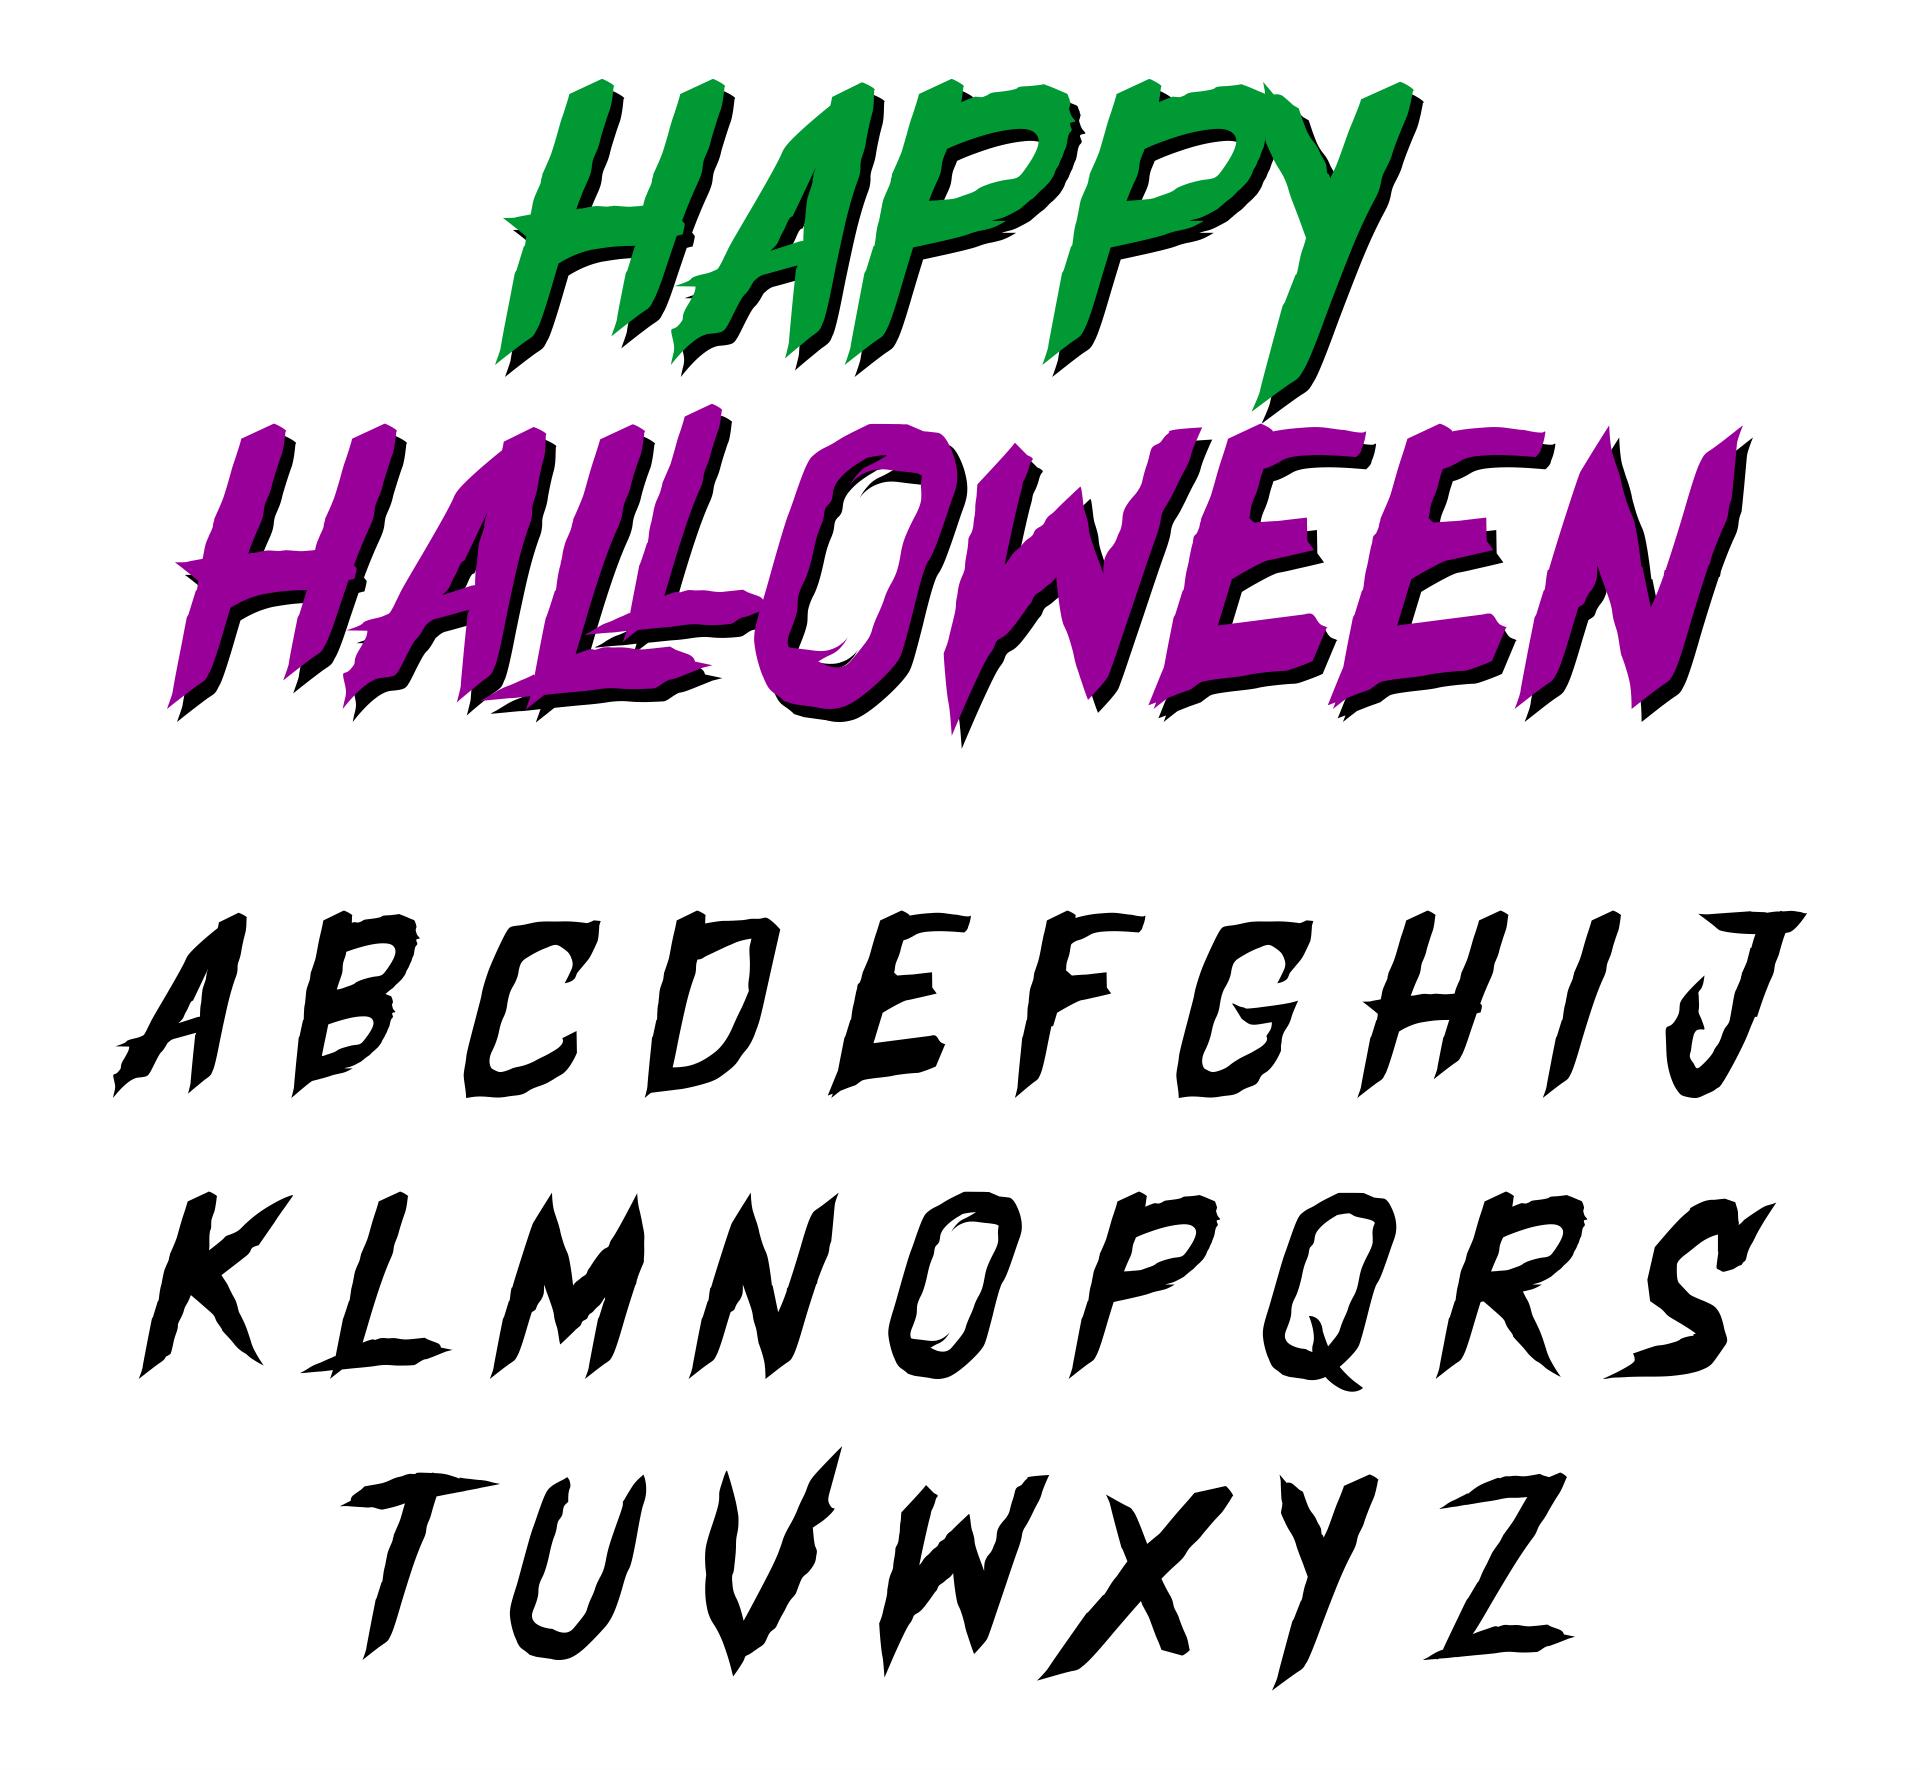 Printables & Free Halloween Fonts